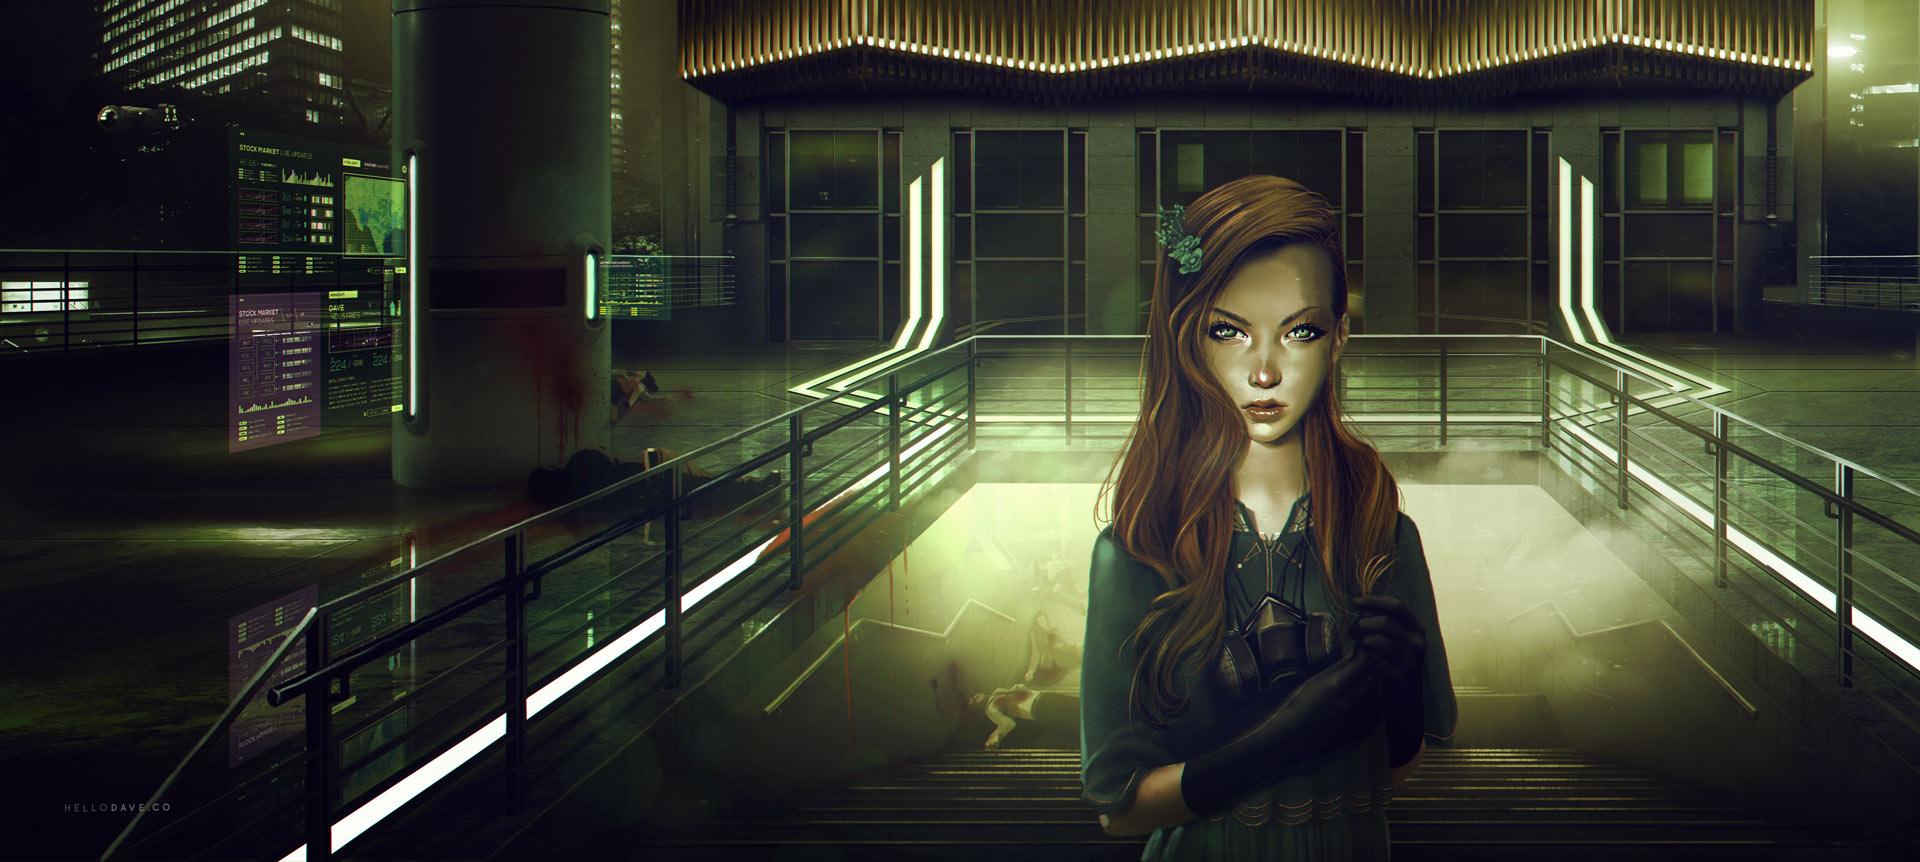 Poison_Ivy_1920px_01